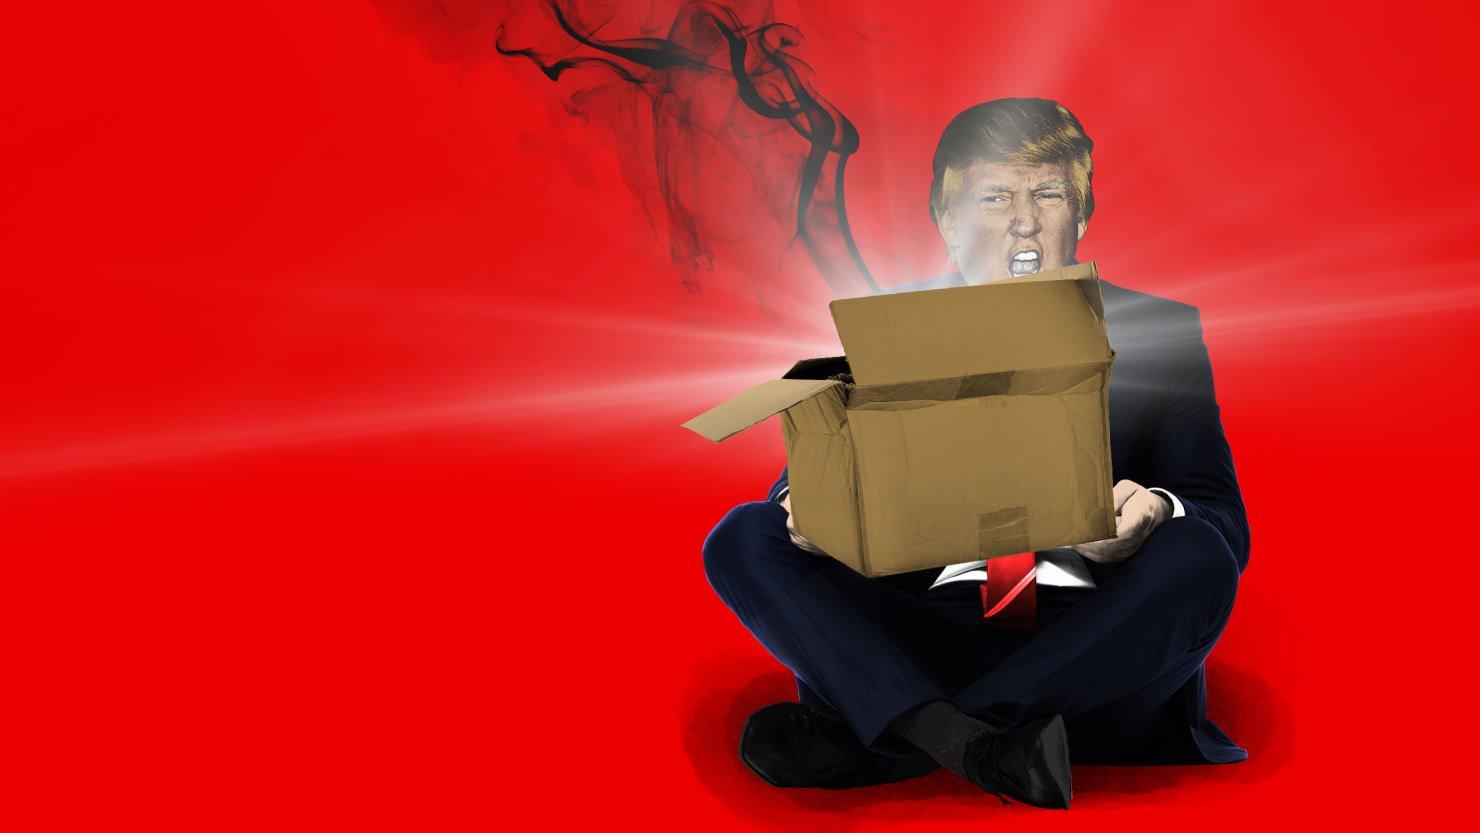 180801-rothkopf-trump-pandora-box-scandal-hero_weqcvx